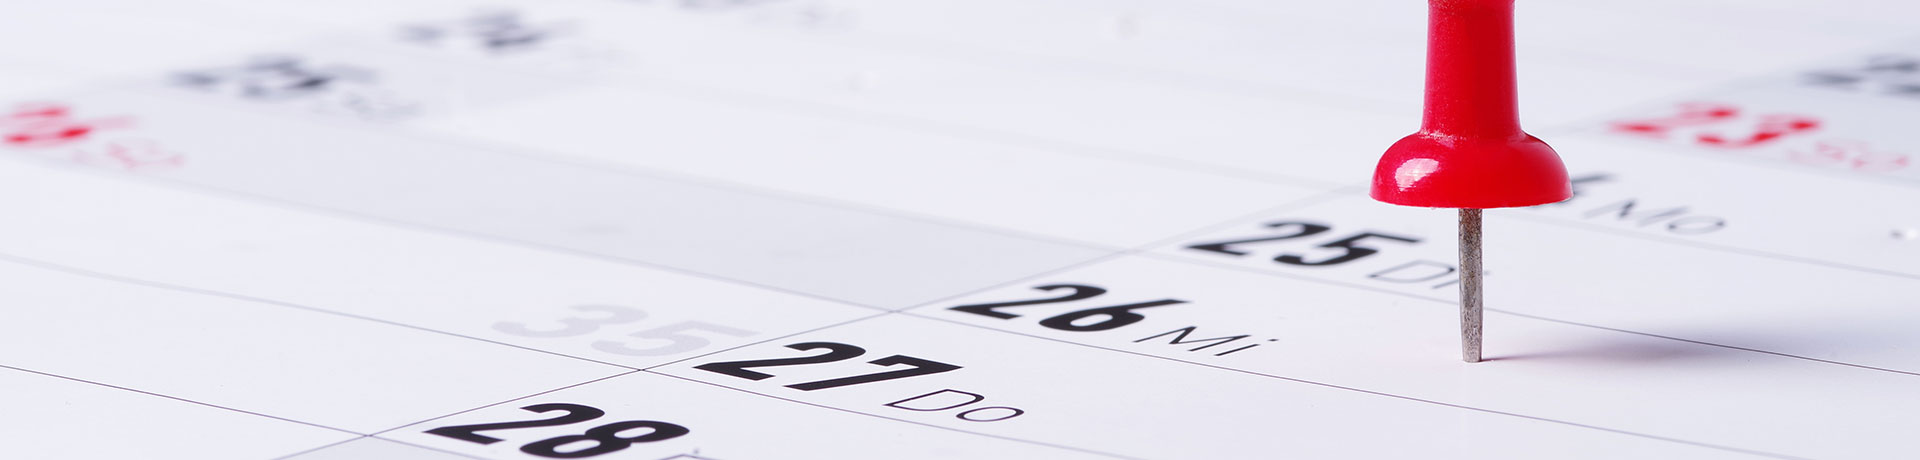 SJO-PETRUS-EN-PAULUS-praktische-info-dagindeling